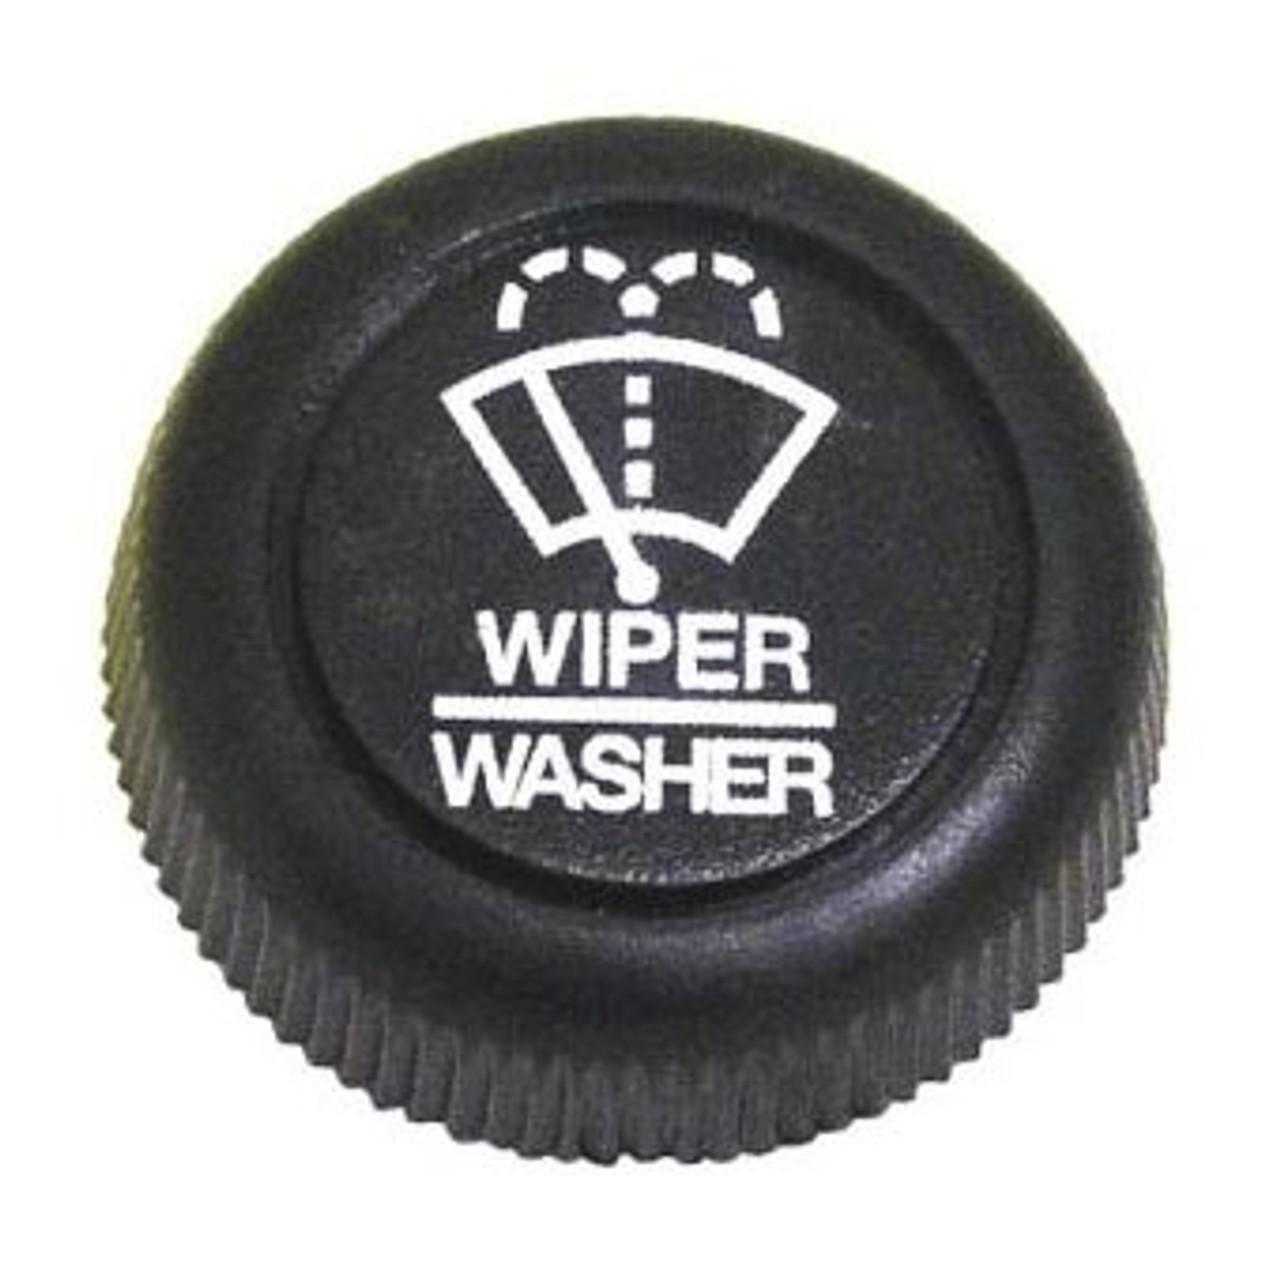 WIPER/WASHER KNOB